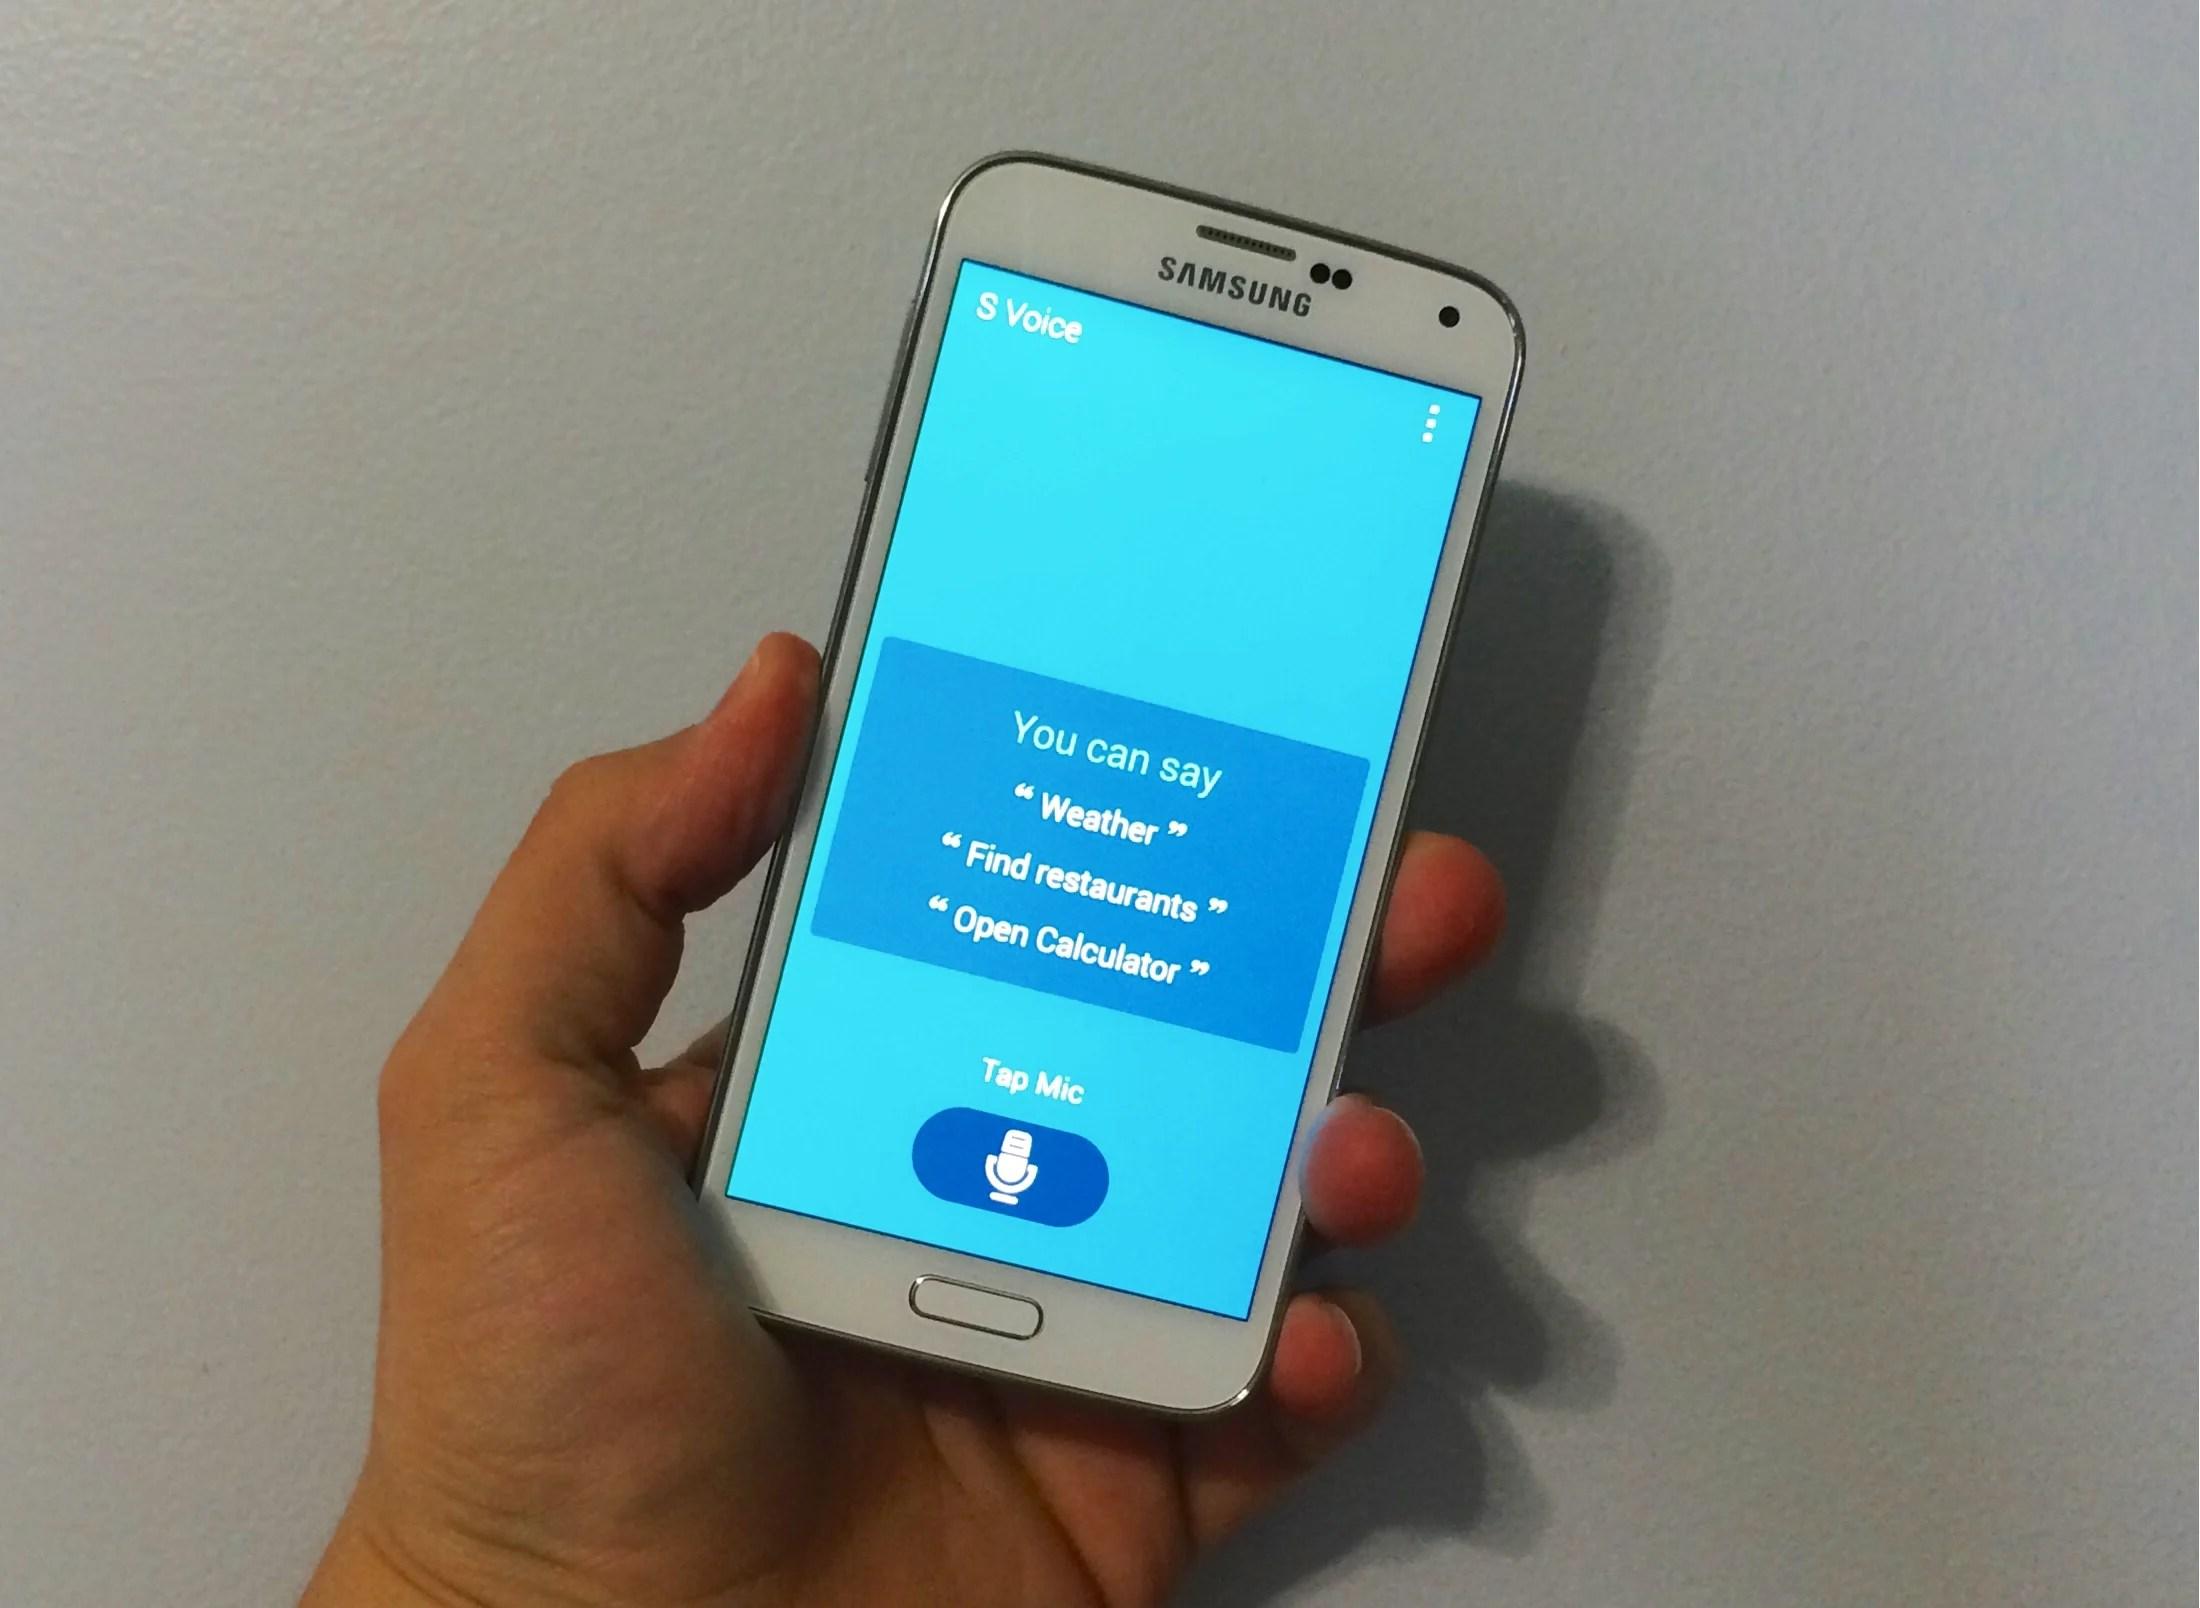 Galaxy S5 S Voice